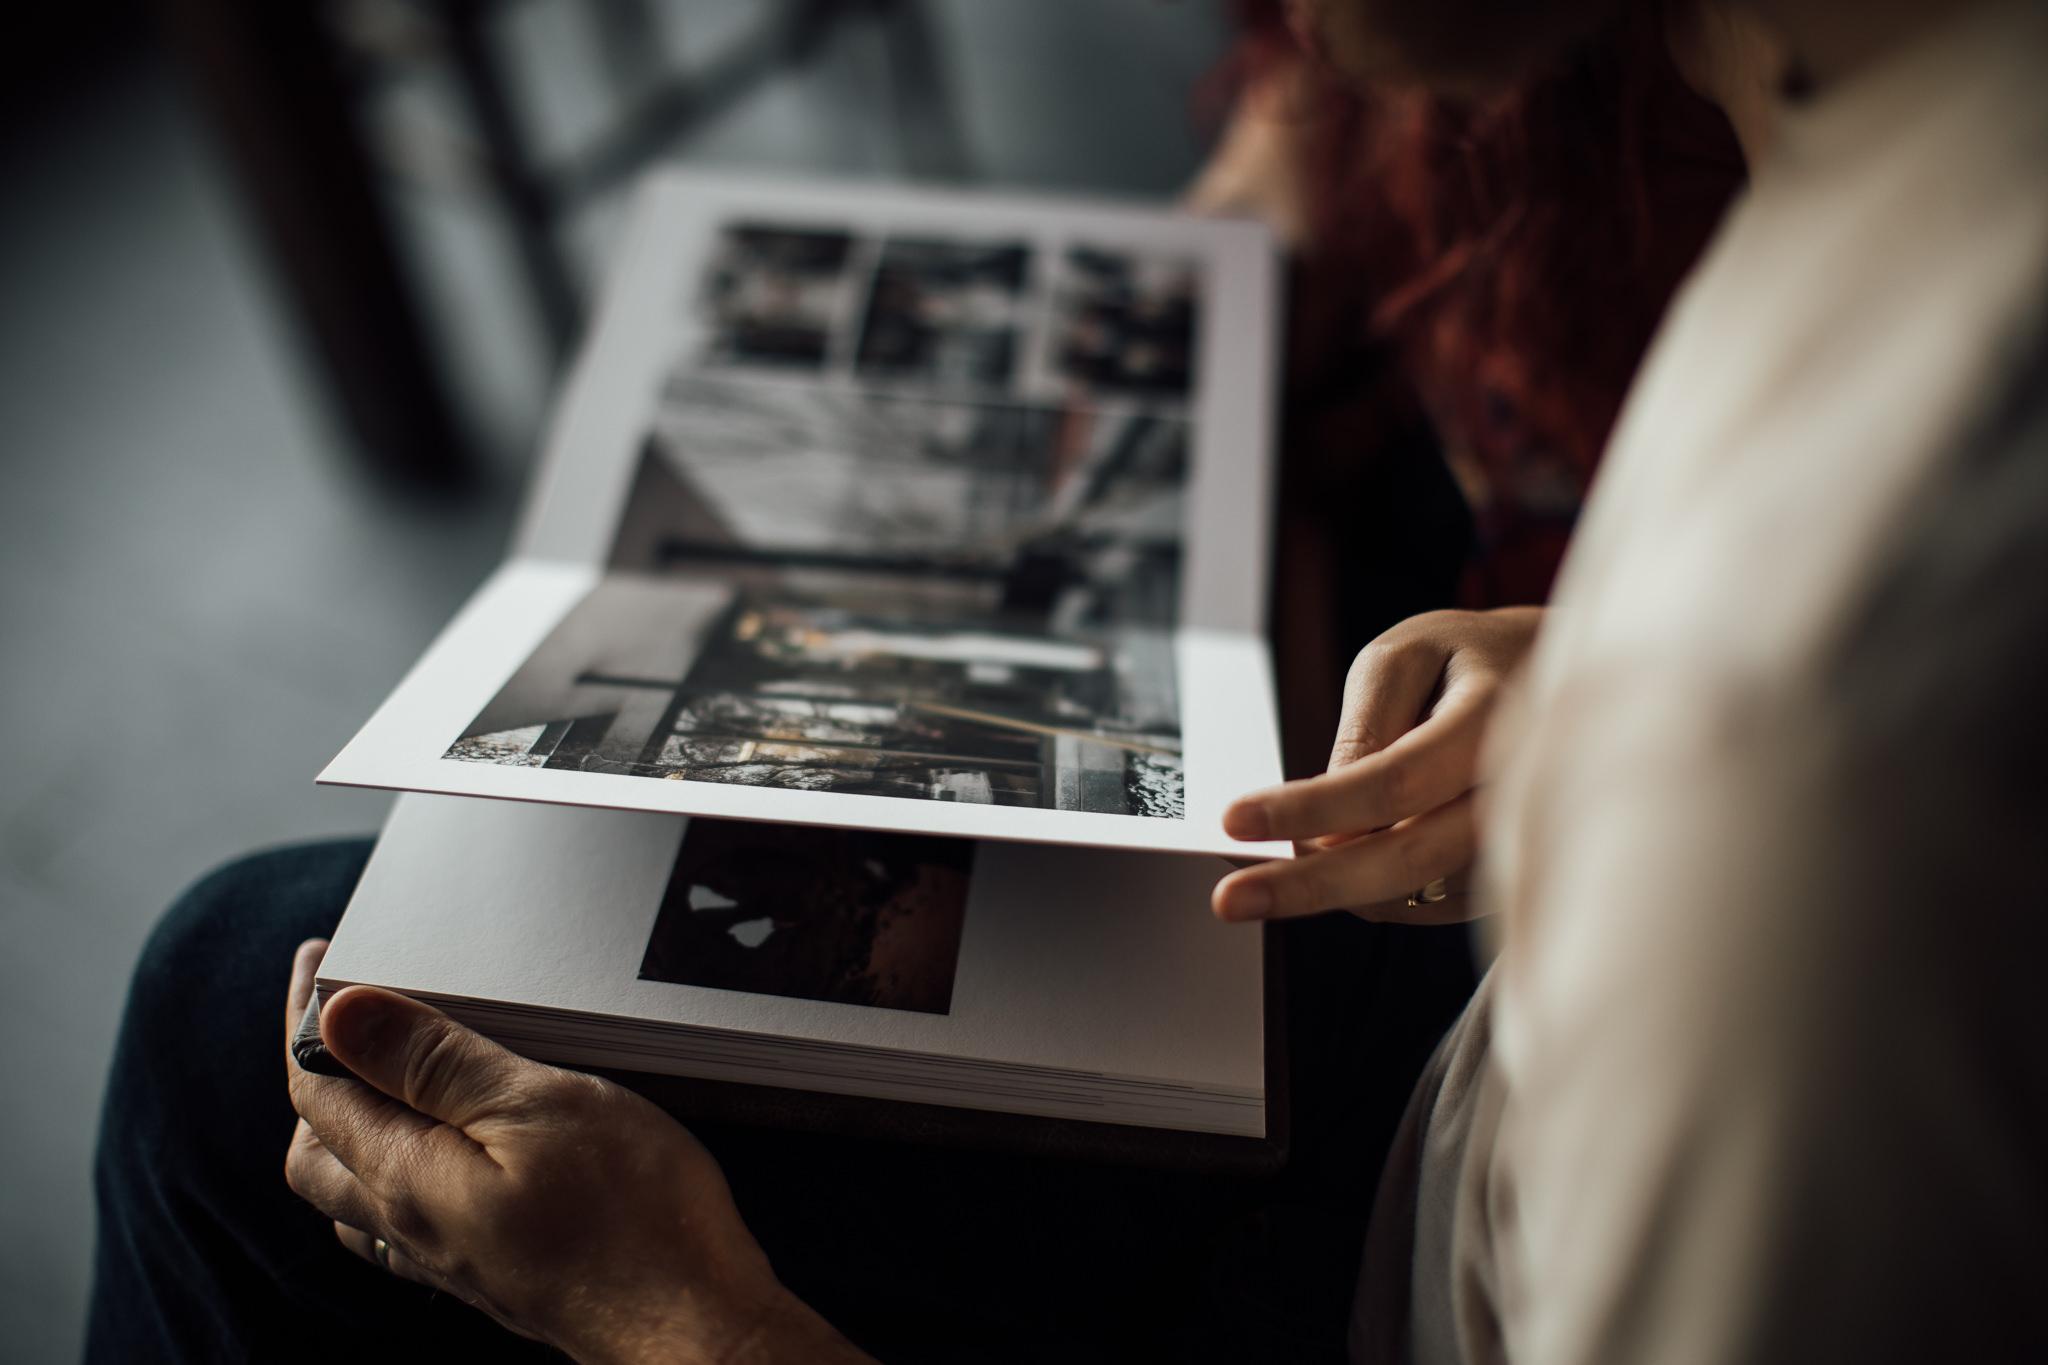 memphis-wedding-photographer-cassie-cook-photography-3.jpg